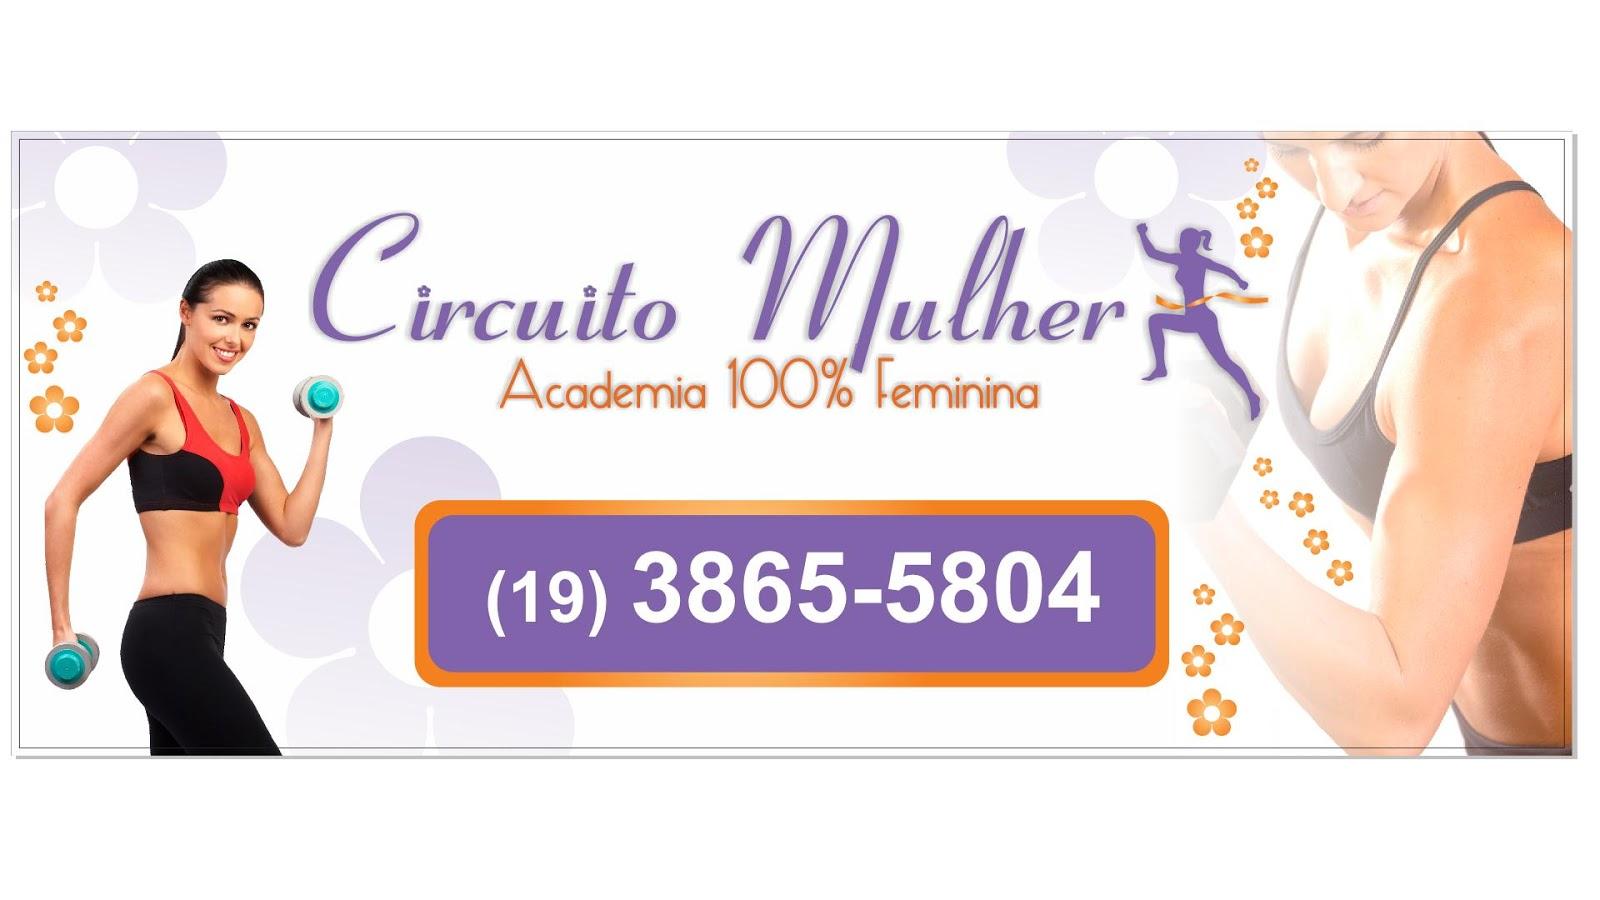 Circuito Na Academia : Circuito mulher academia feminina